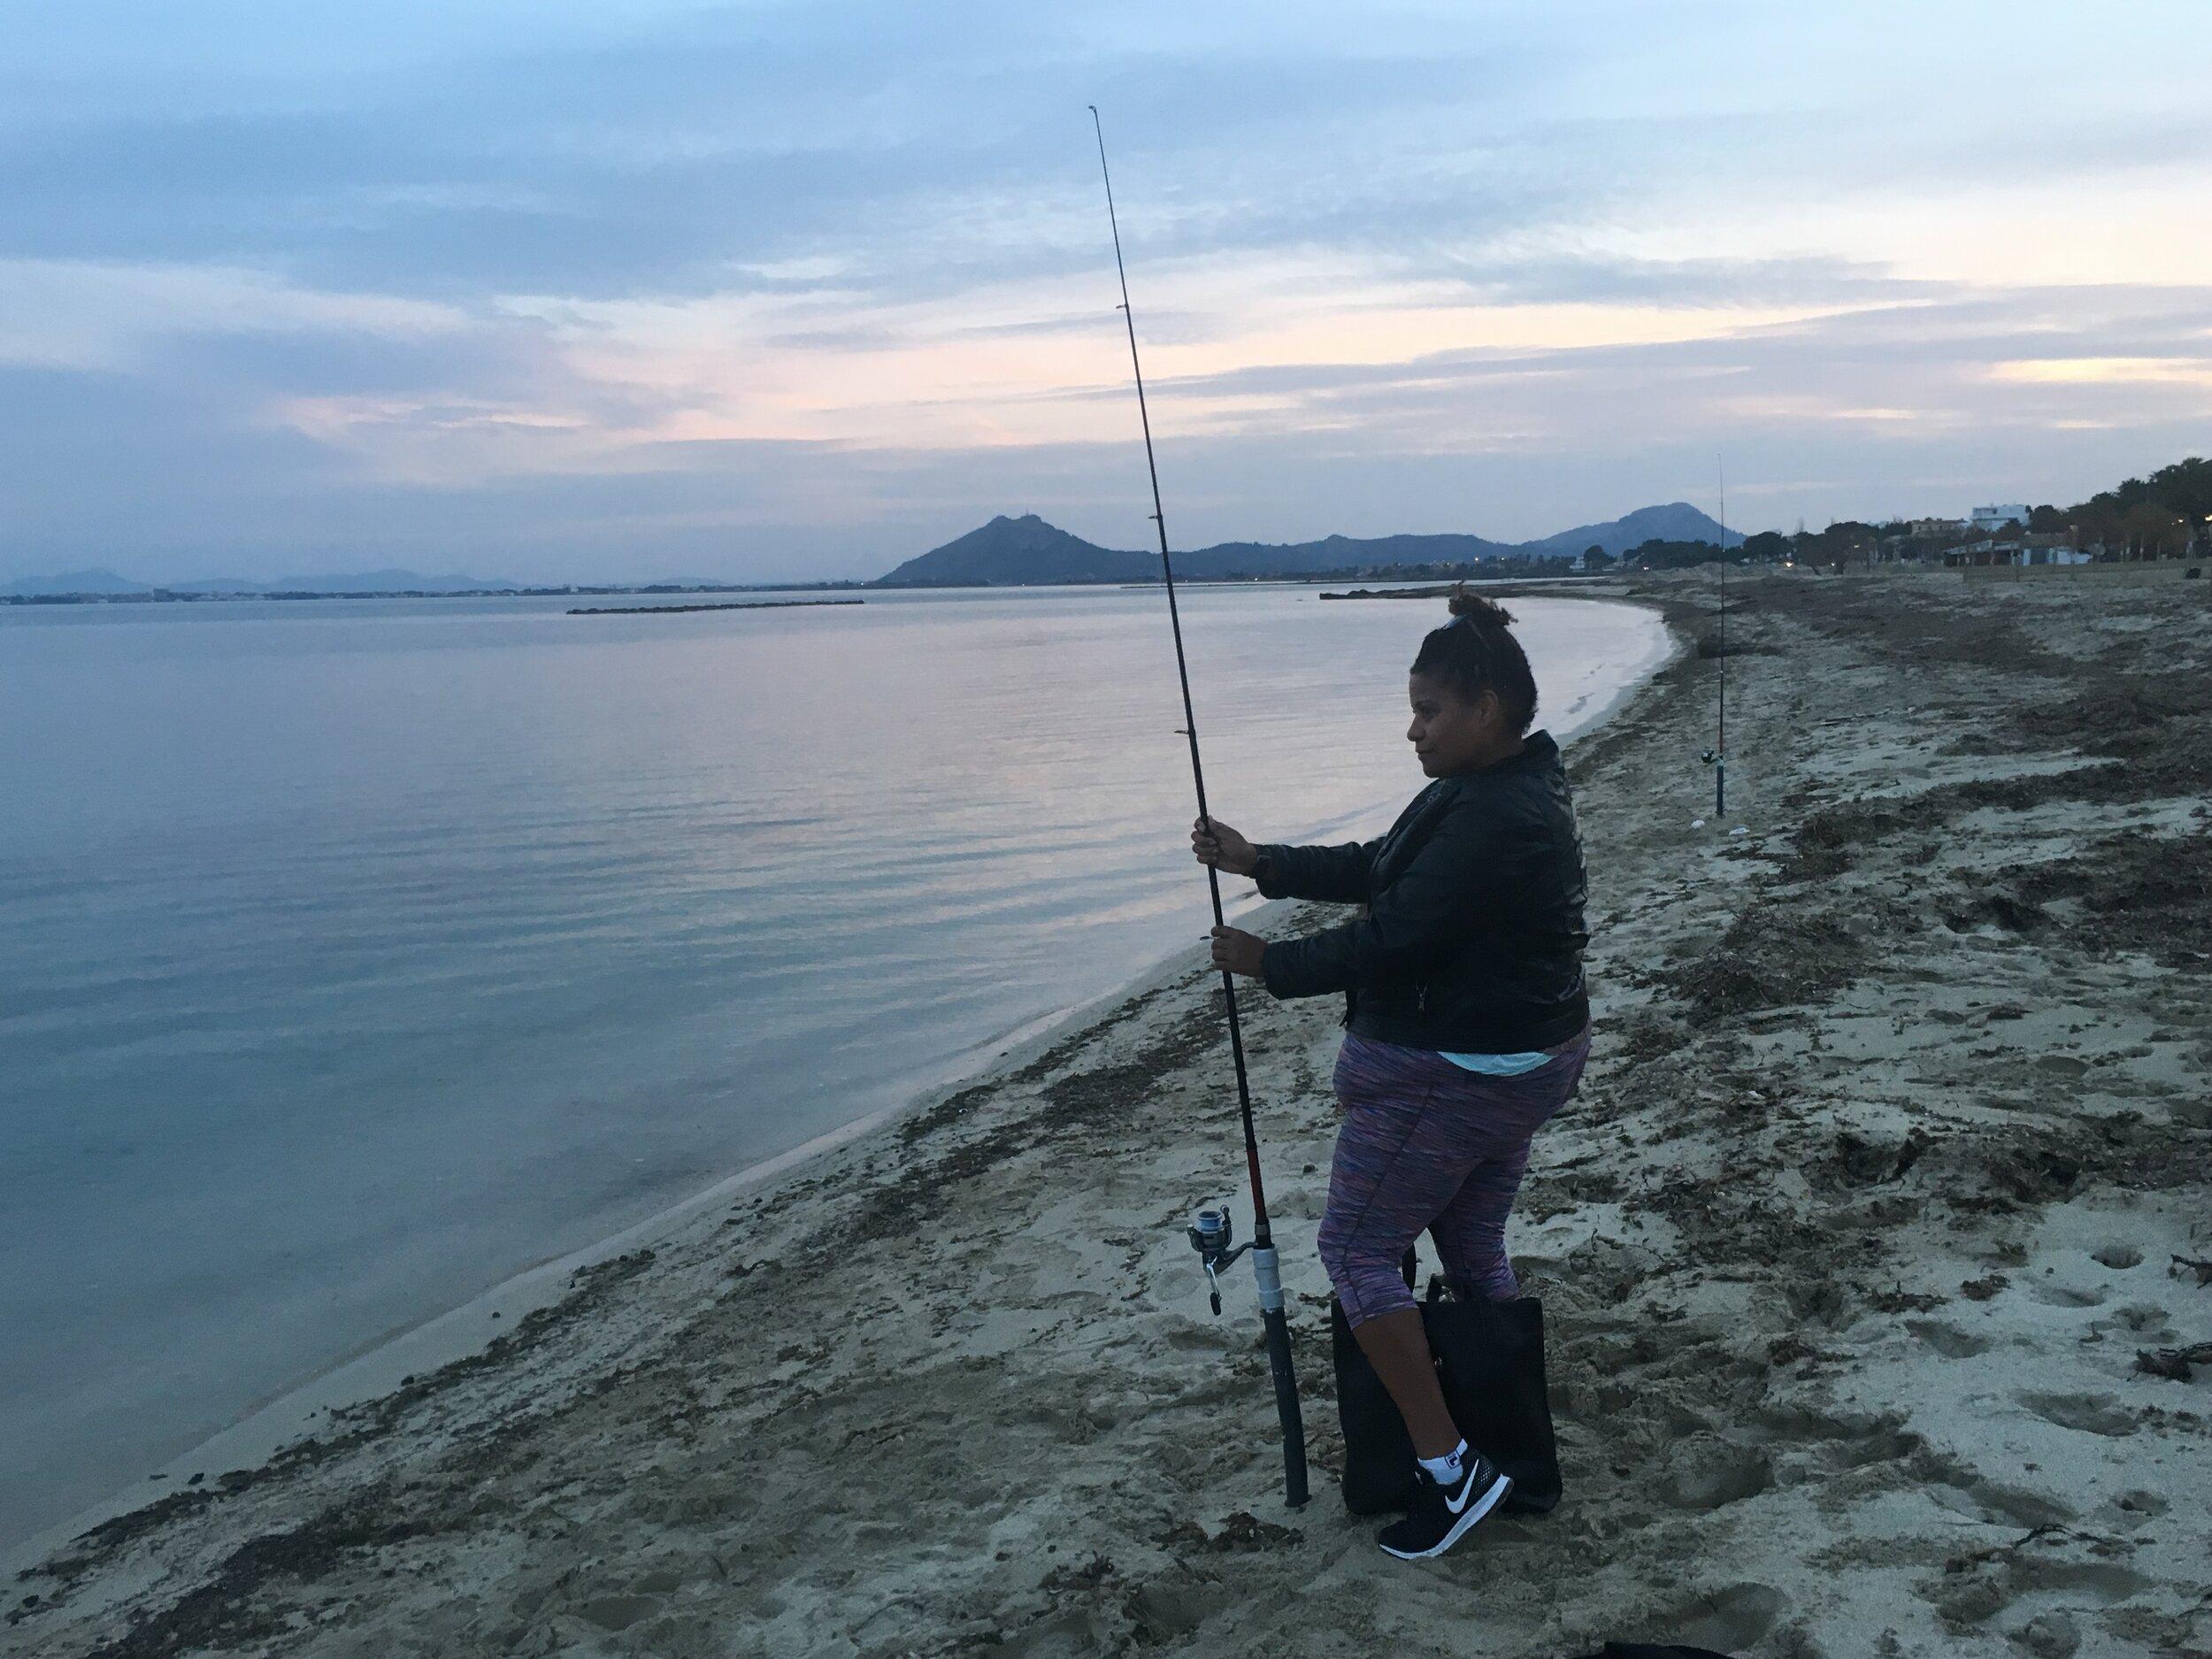 Fishing in Spain